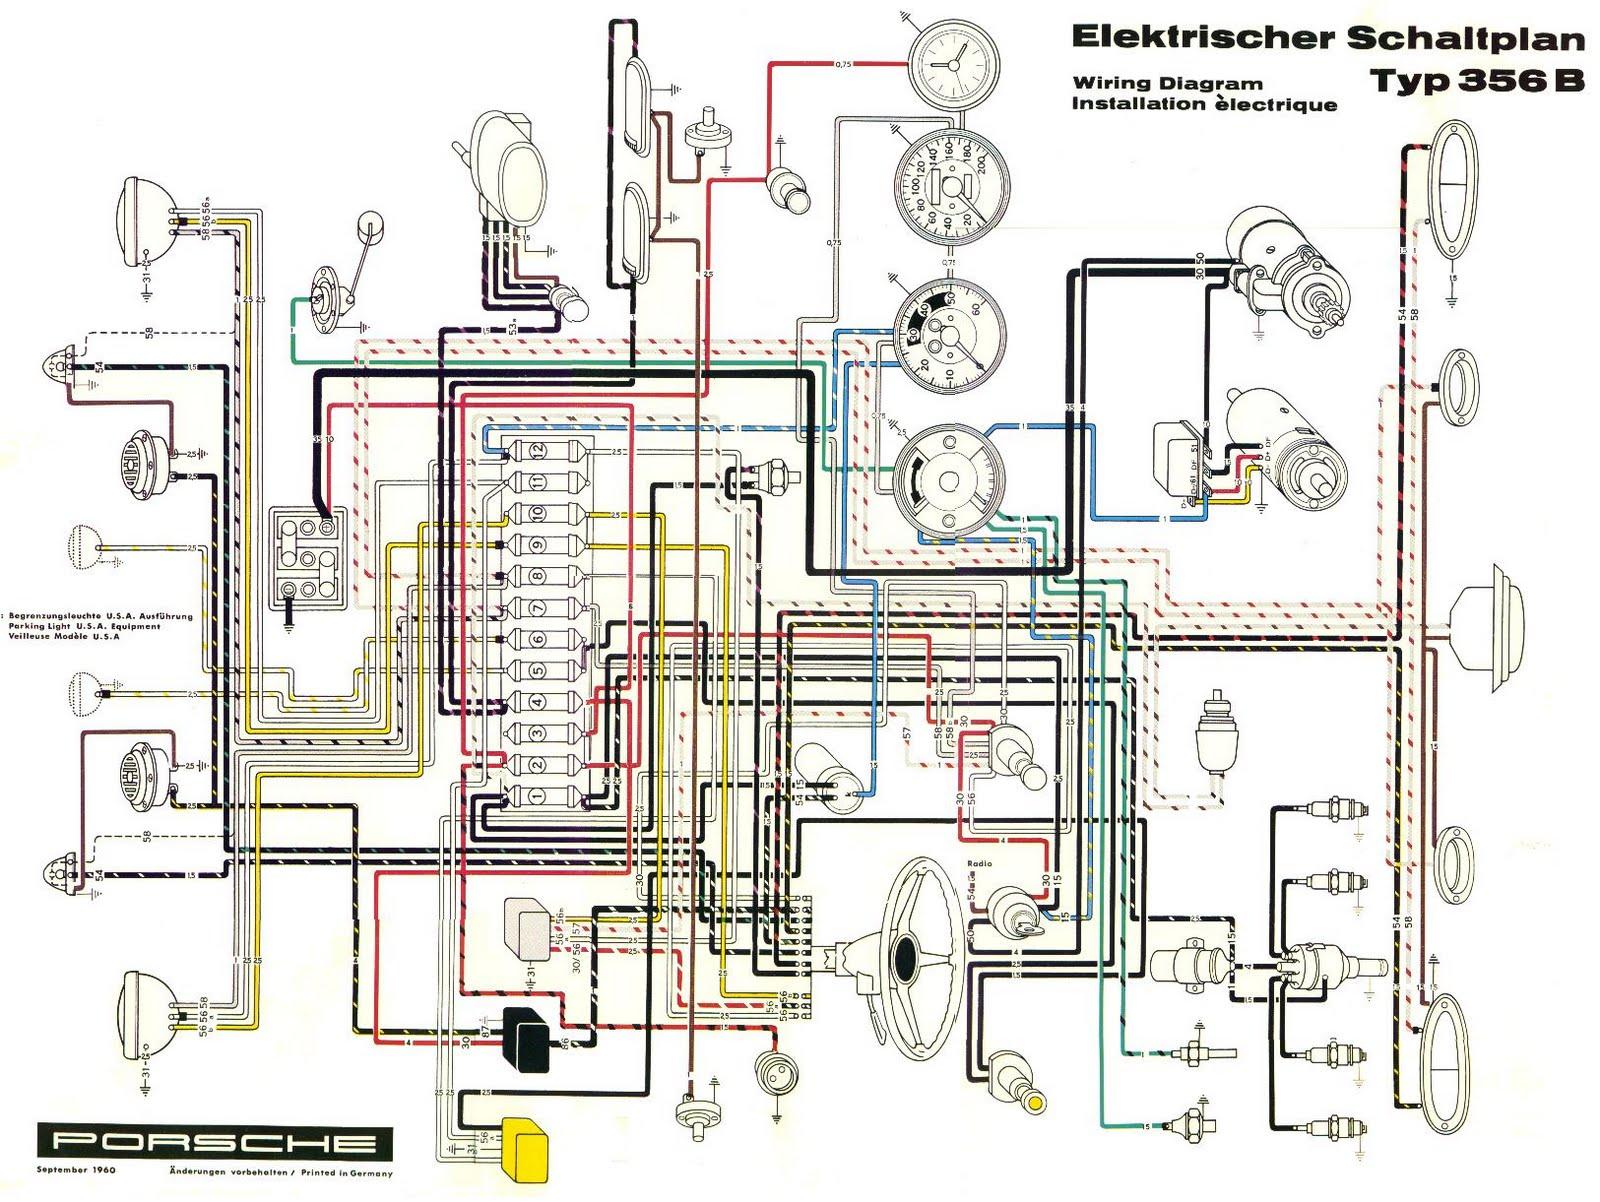 small resolution of peugeot boxer 3 wiring diagram wiring library rh 91 evitta de bathroom electrical wiring diagram bathroom